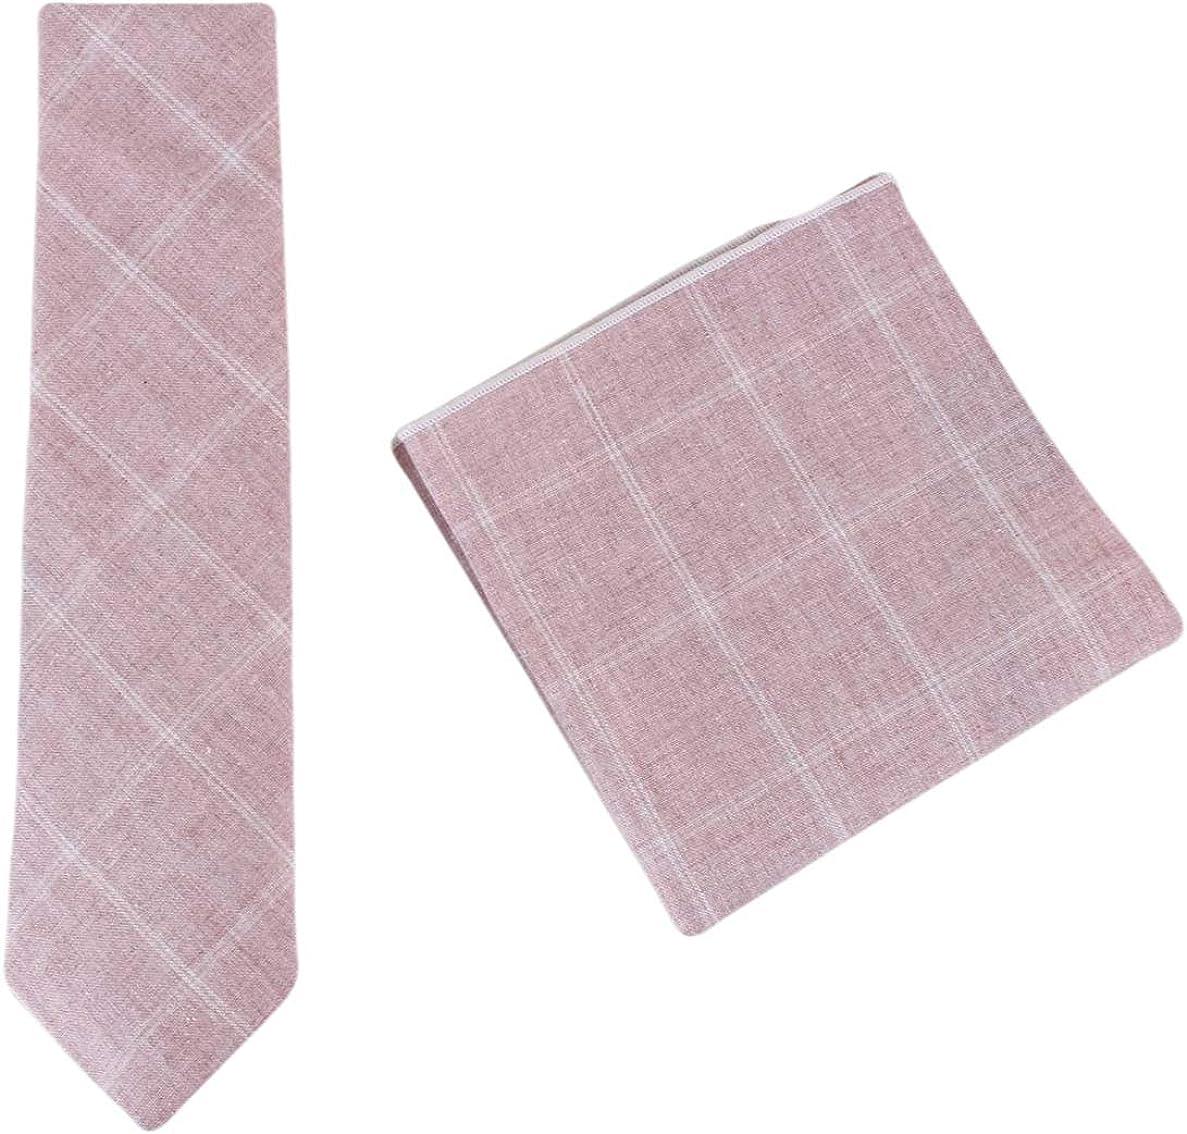 Knightsbridge Neckwear Mens Cotton Tie and Pocket Square Set - Dusk Pink